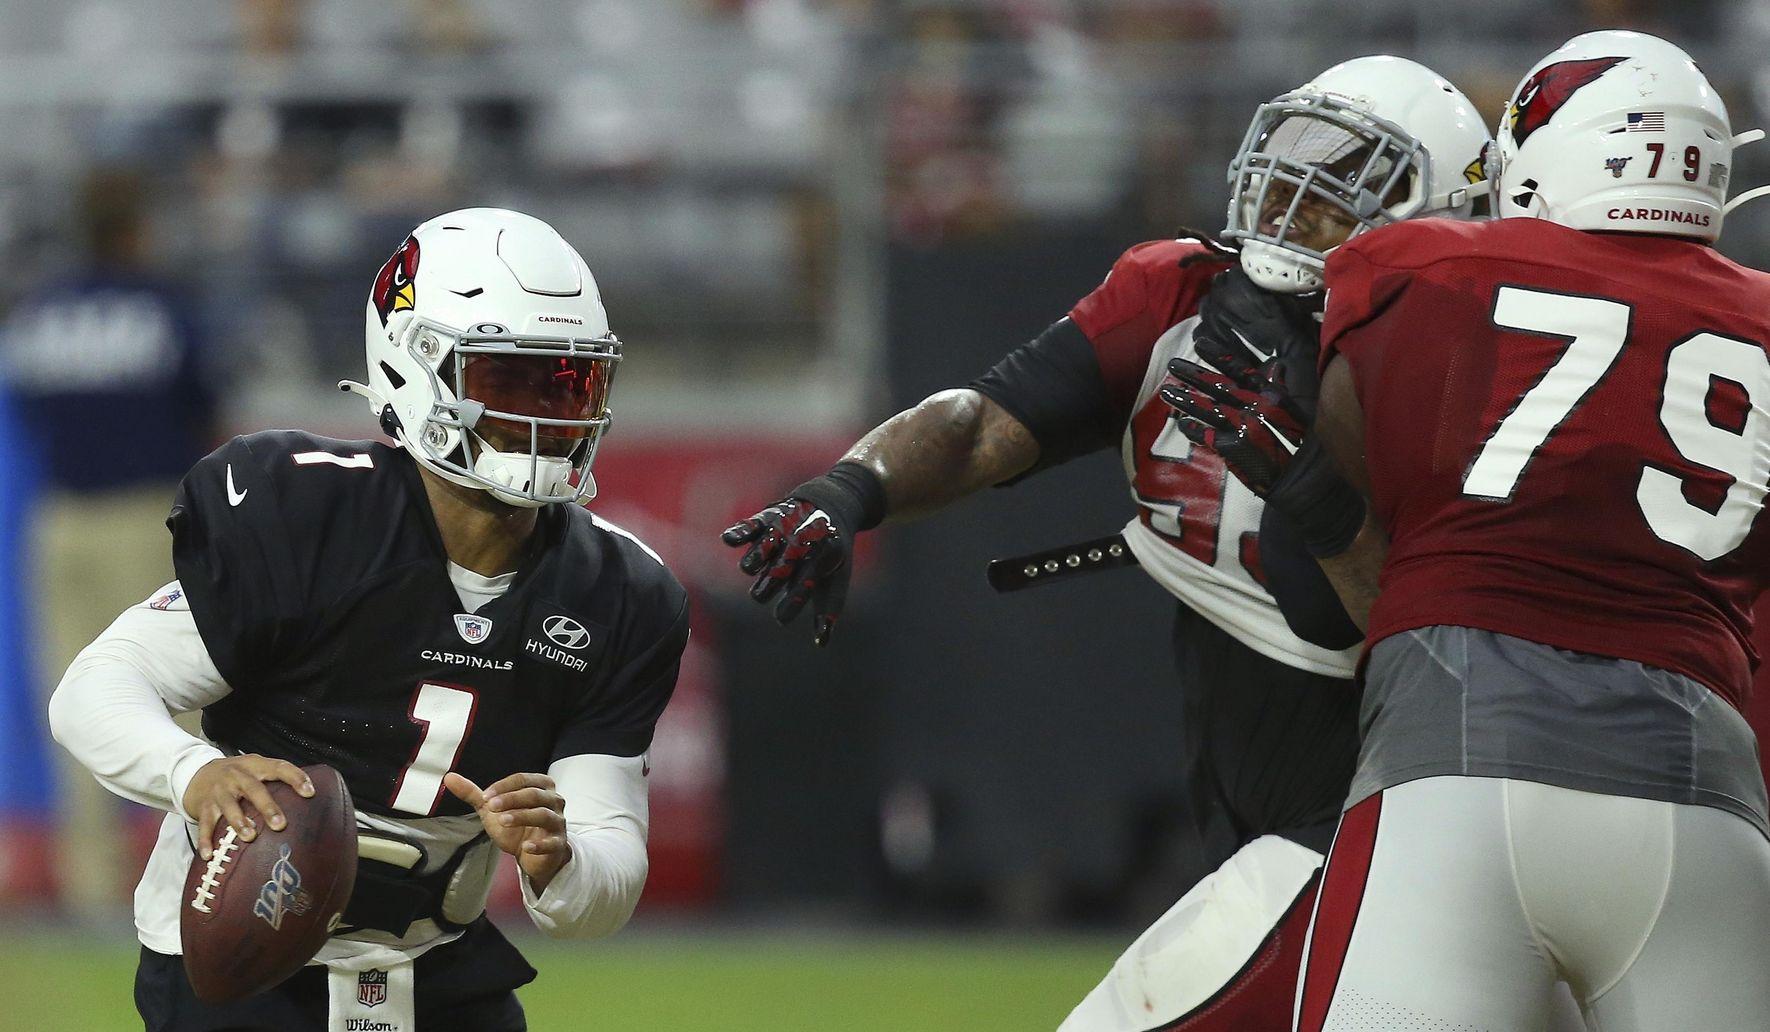 Cardinals release Darius Philon day after arrest - Arkansas News Online